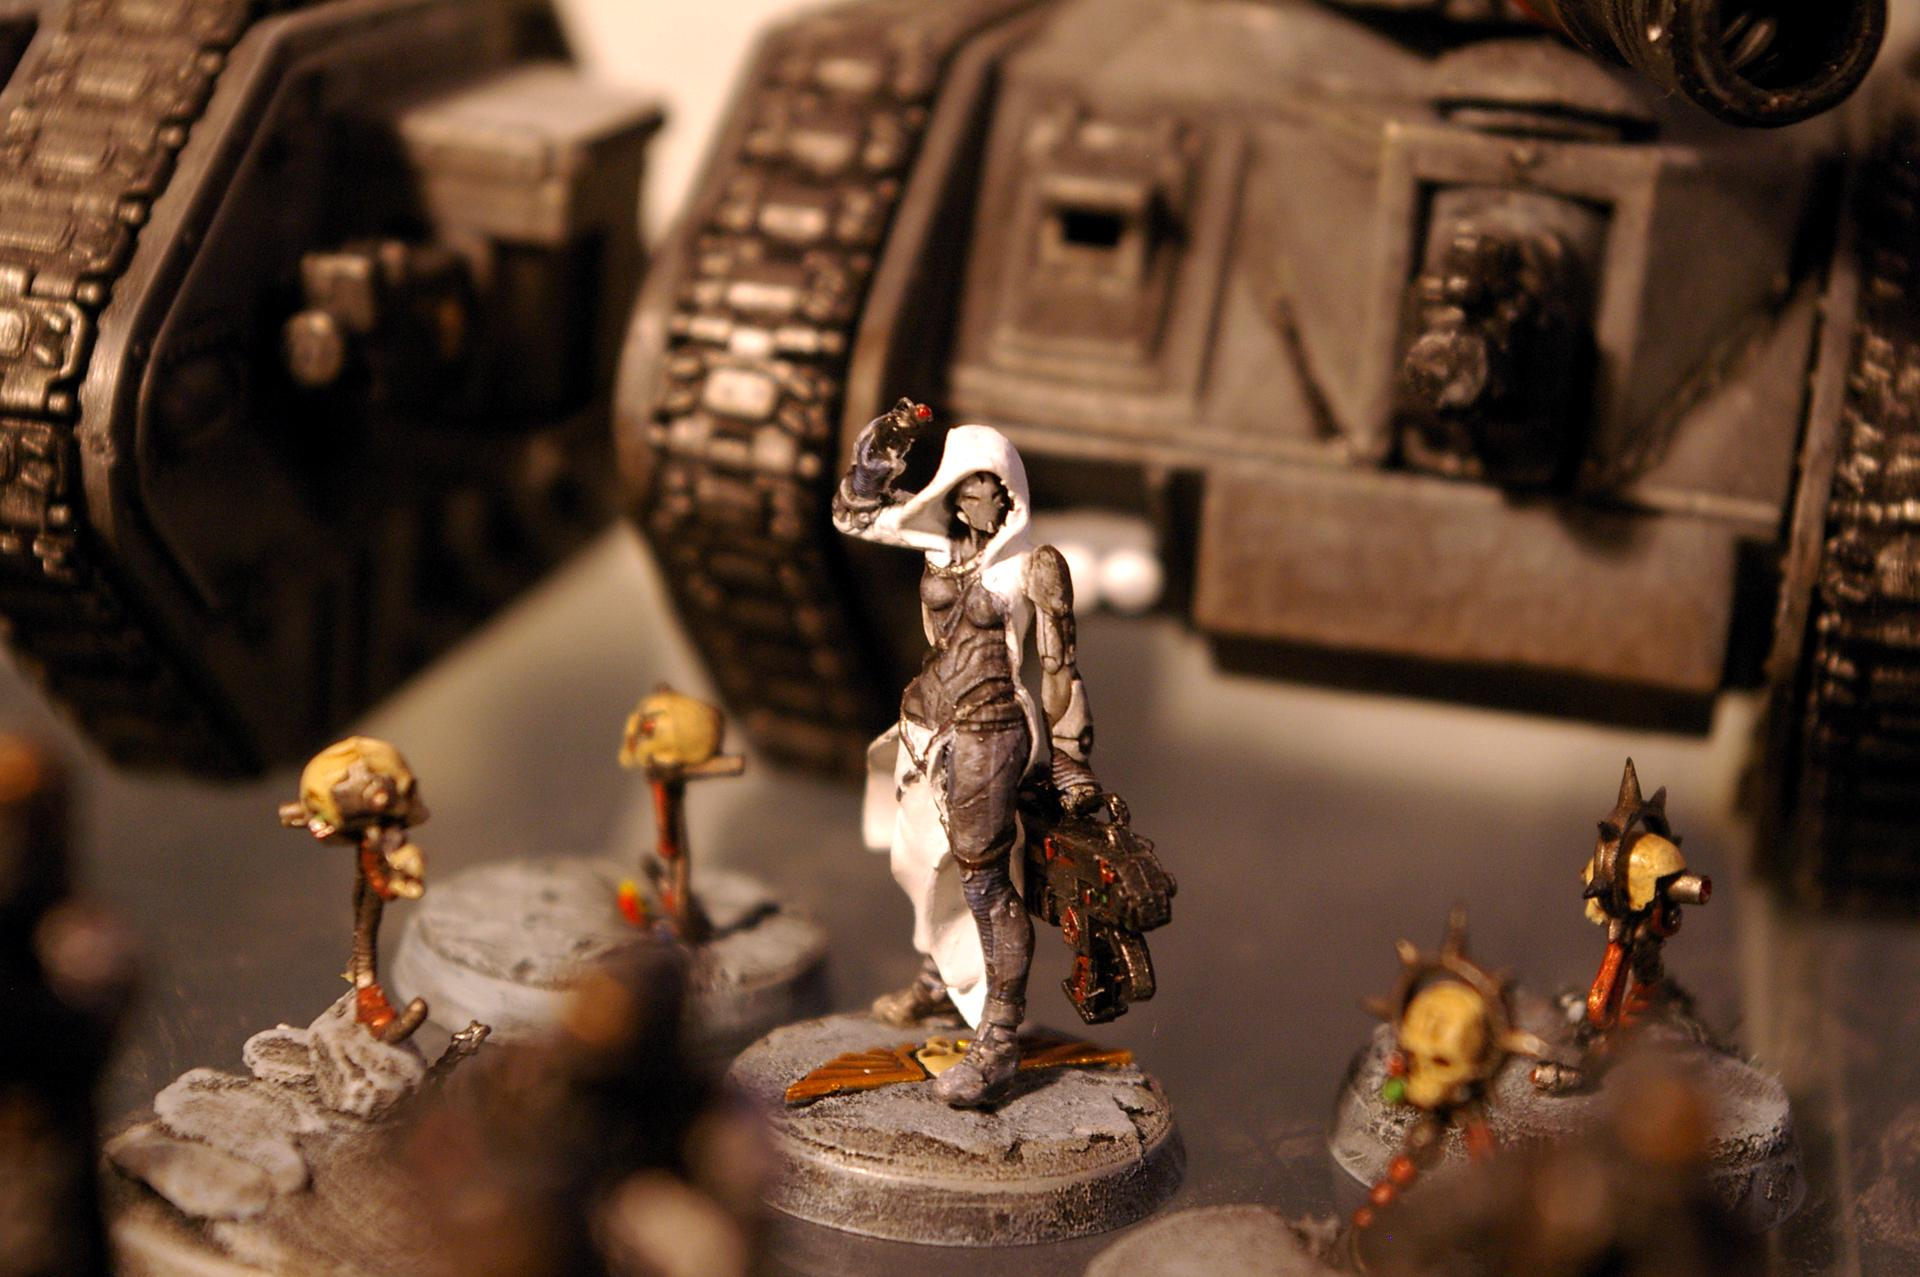 Female, Hood, Infinity, Inquisitor, Robe